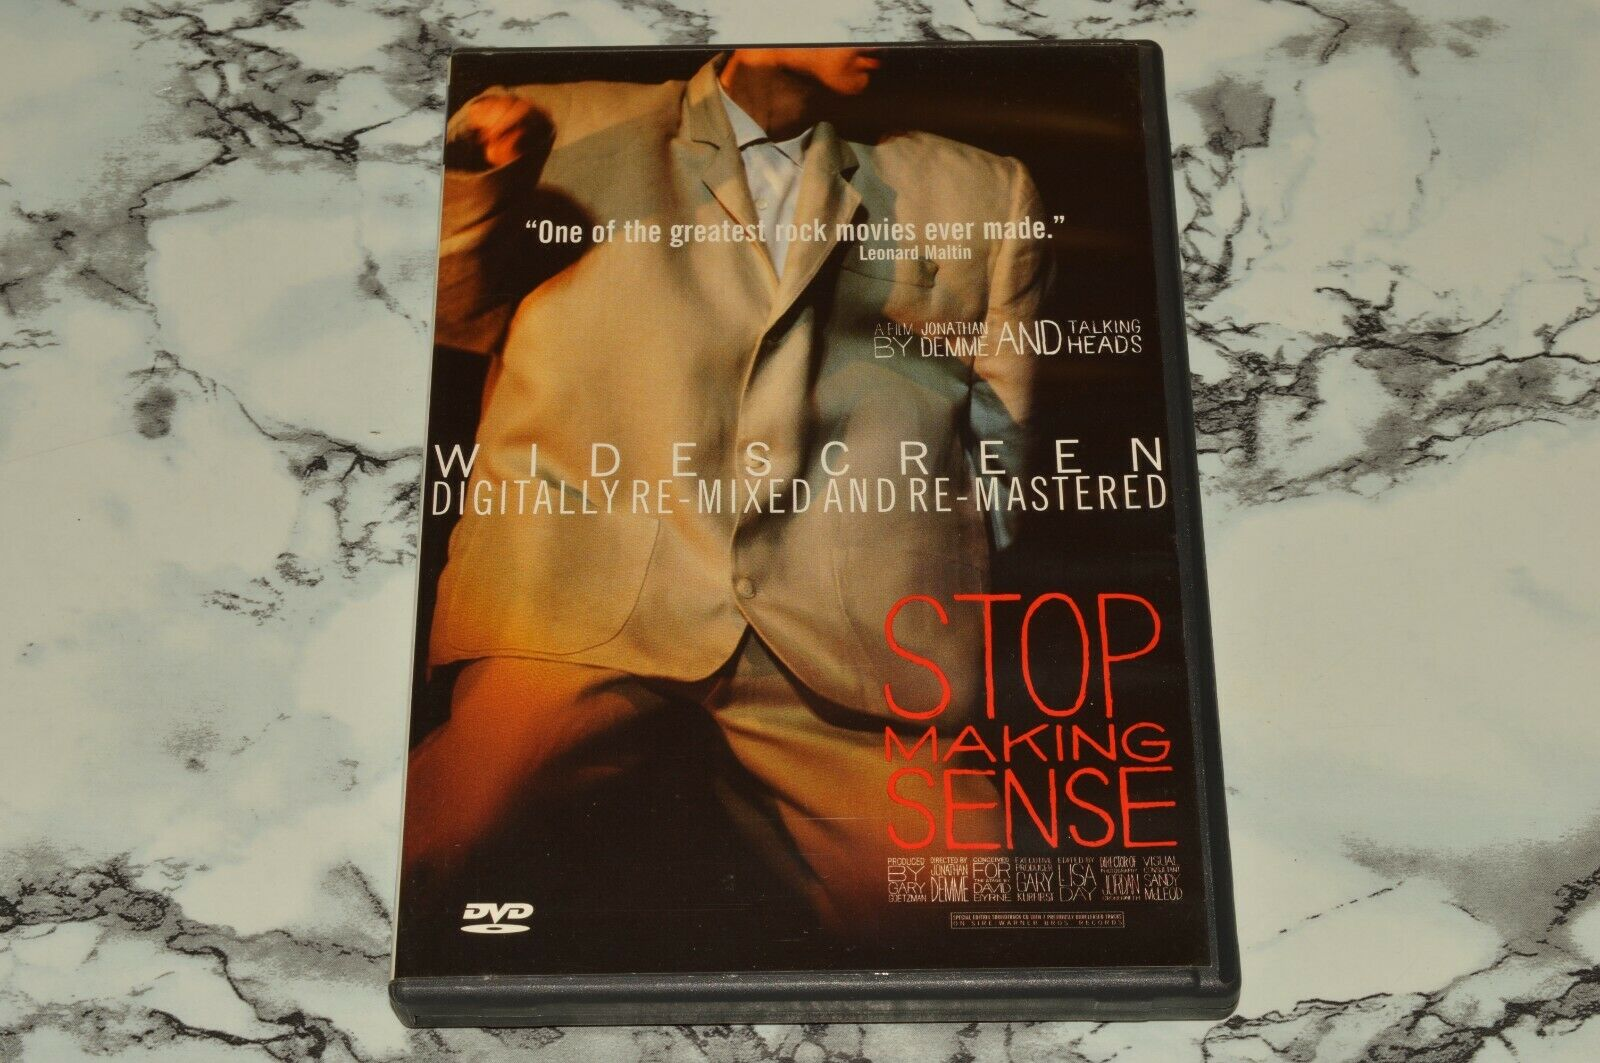 Stop Making Sense - Widescreen DVD -- Jonathan Demme Talking Heads - $12.68